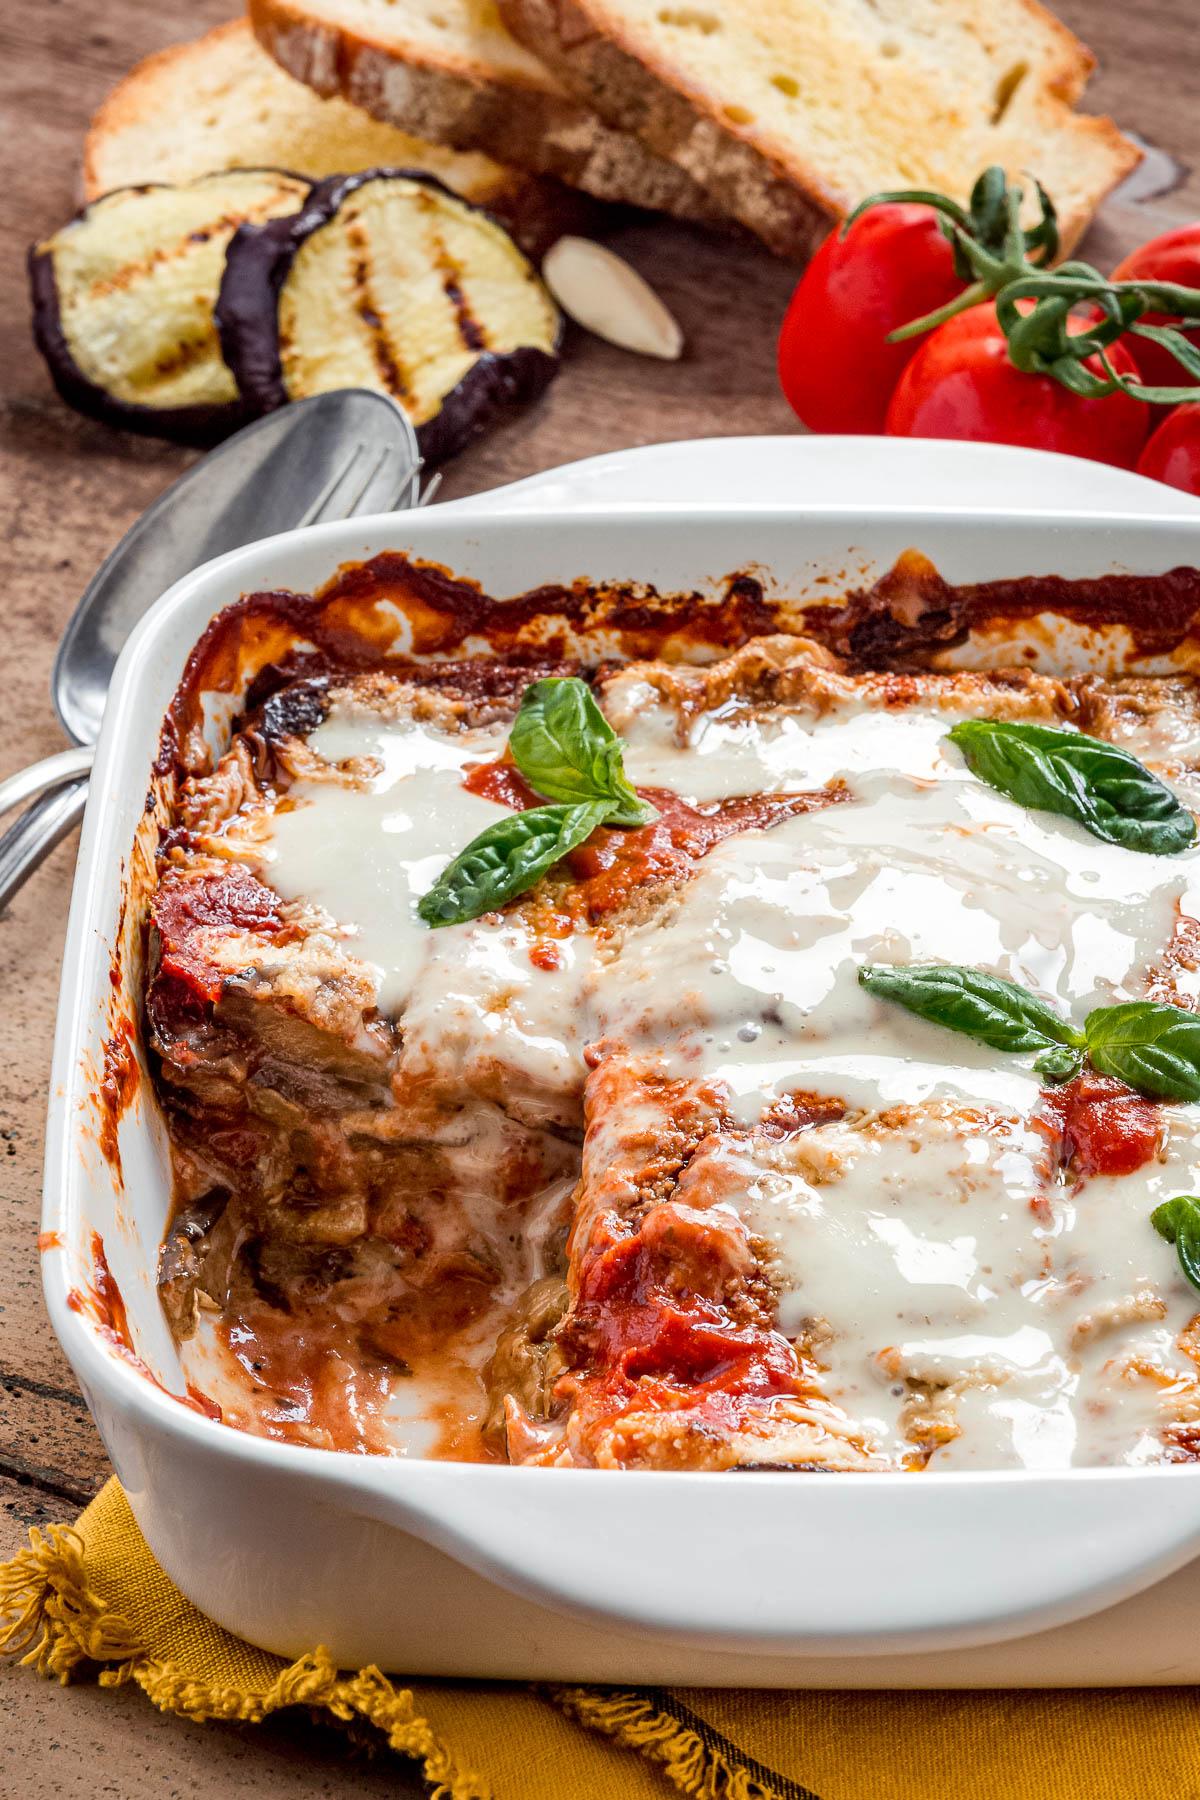 Italian Vegan EGGPLANT PARMESAN recipe with homemade vegan mozzarella MELANZANE alla PARMIGIANA VEGAN LIGHT al FORNO con mozzarella vegan fatta in casa e parmigiano veg